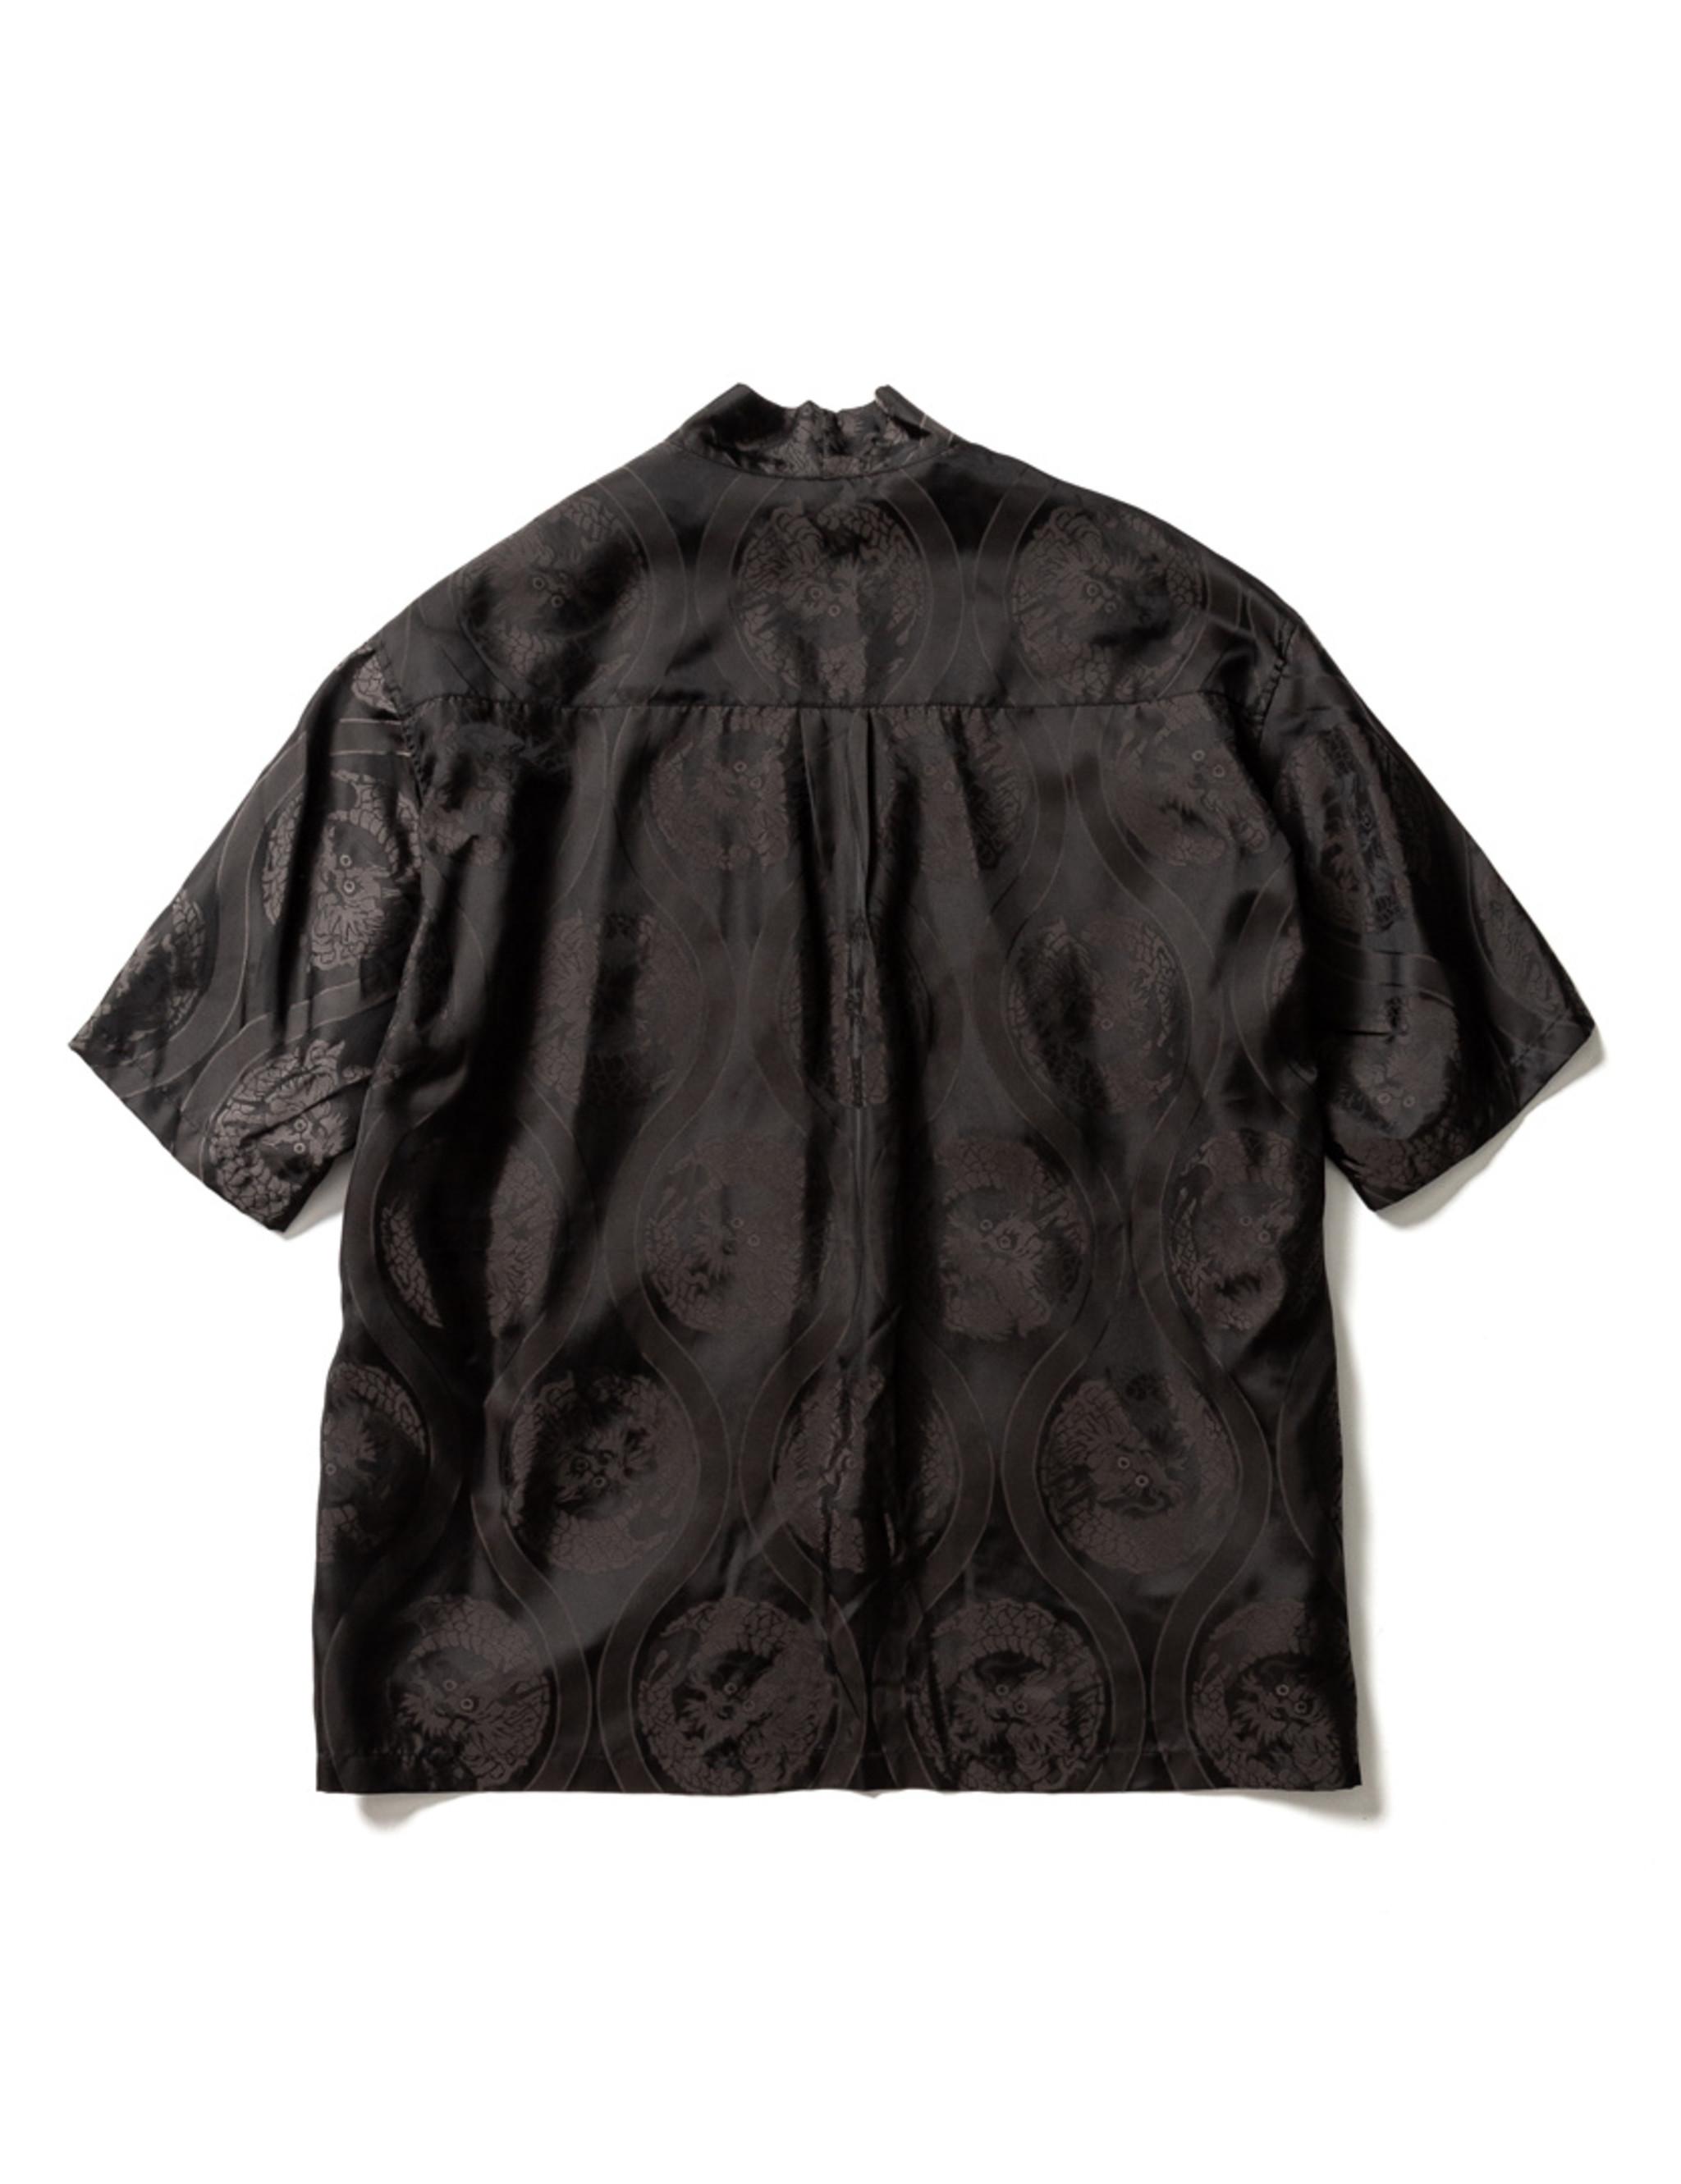 Sasquatchfabrix. ORIENTAL DRAGON HAORI SHIRT - Black